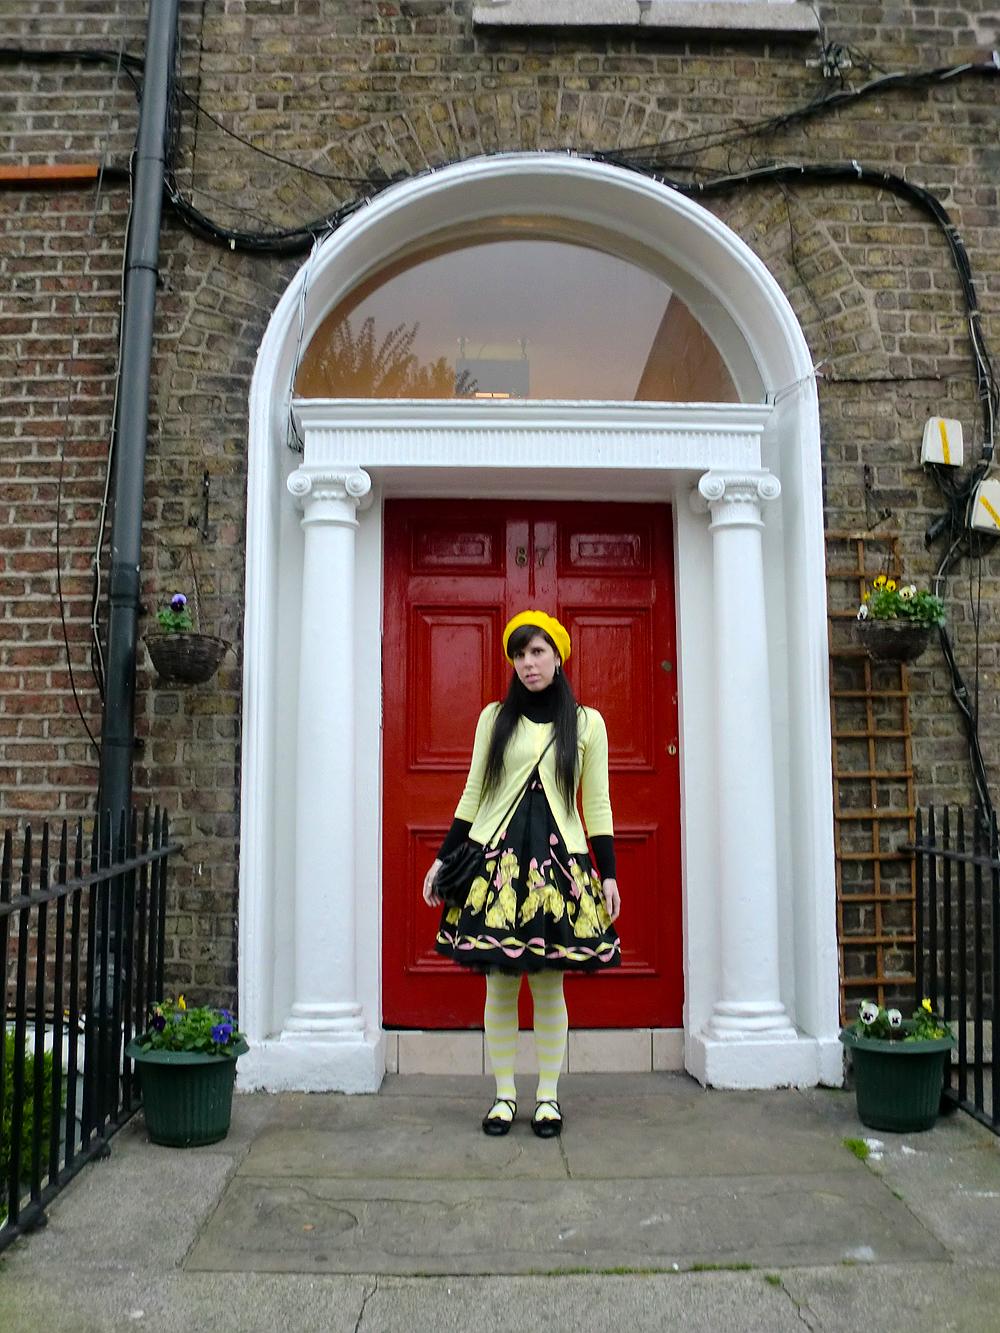 Dublin Red Door - Dublin, Ireland.